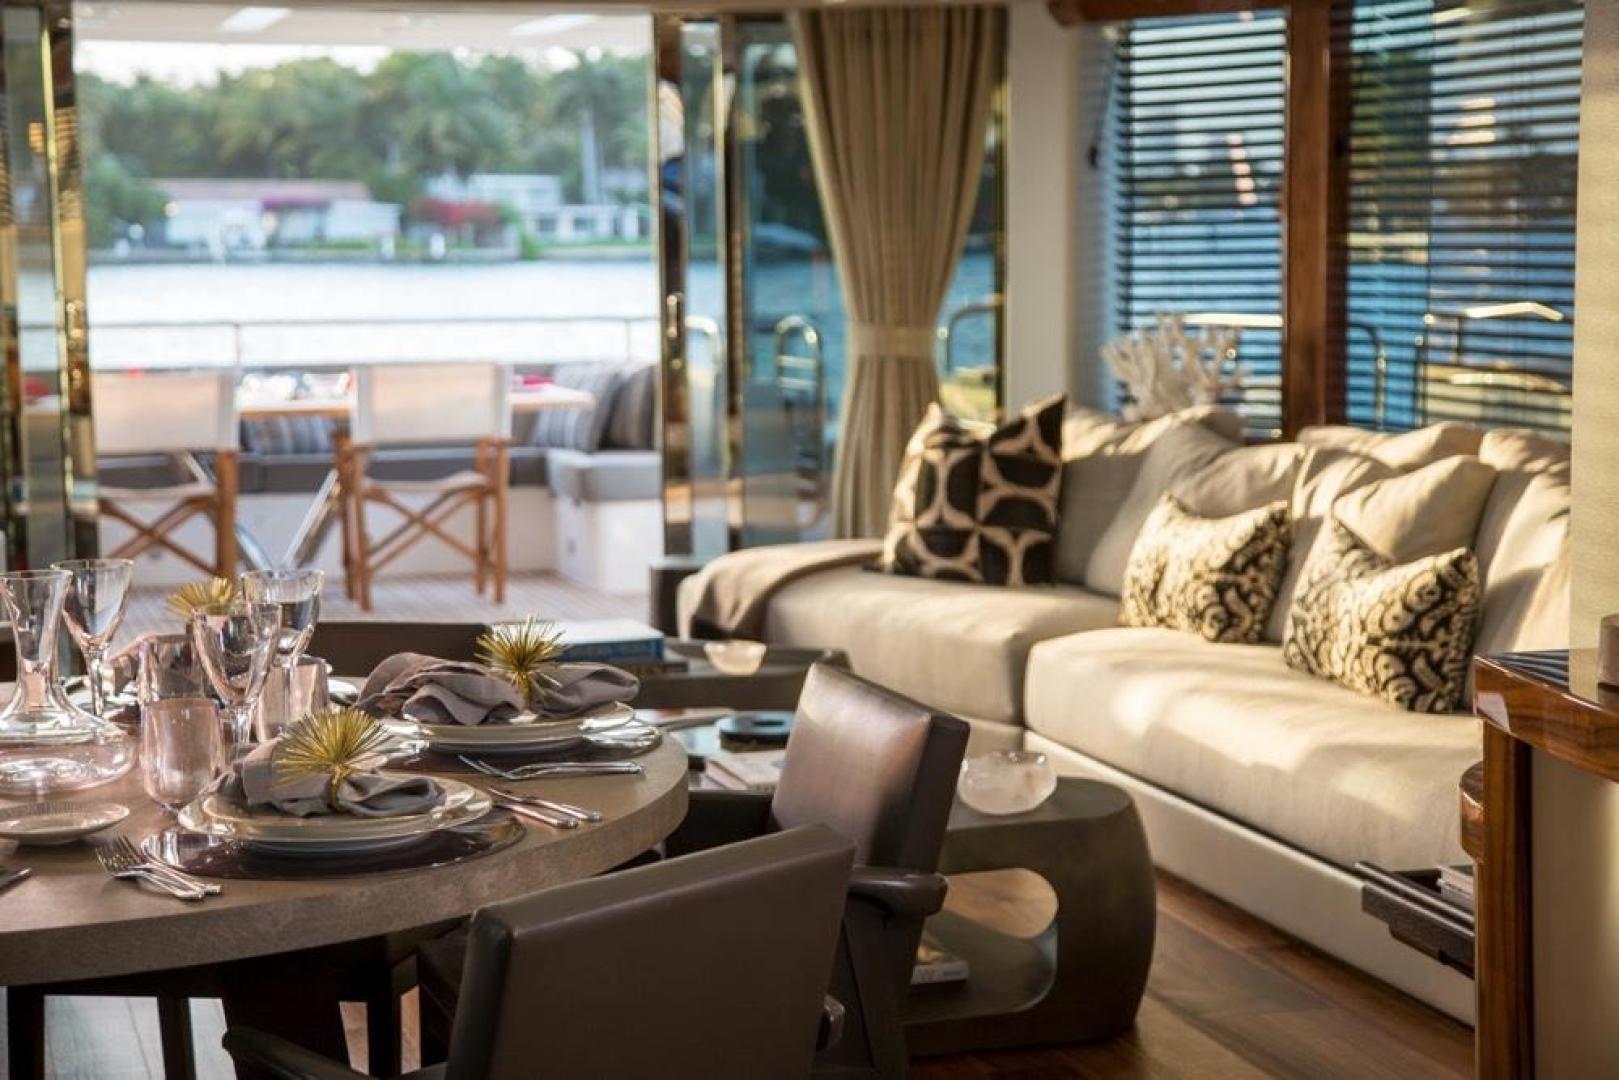 Sunseeker-28 Metre Yacht 2016-RIII Miami-Florida-United States-2016 SUNSEEKER 92 RIII FOR SALE-600098 | Thumbnail